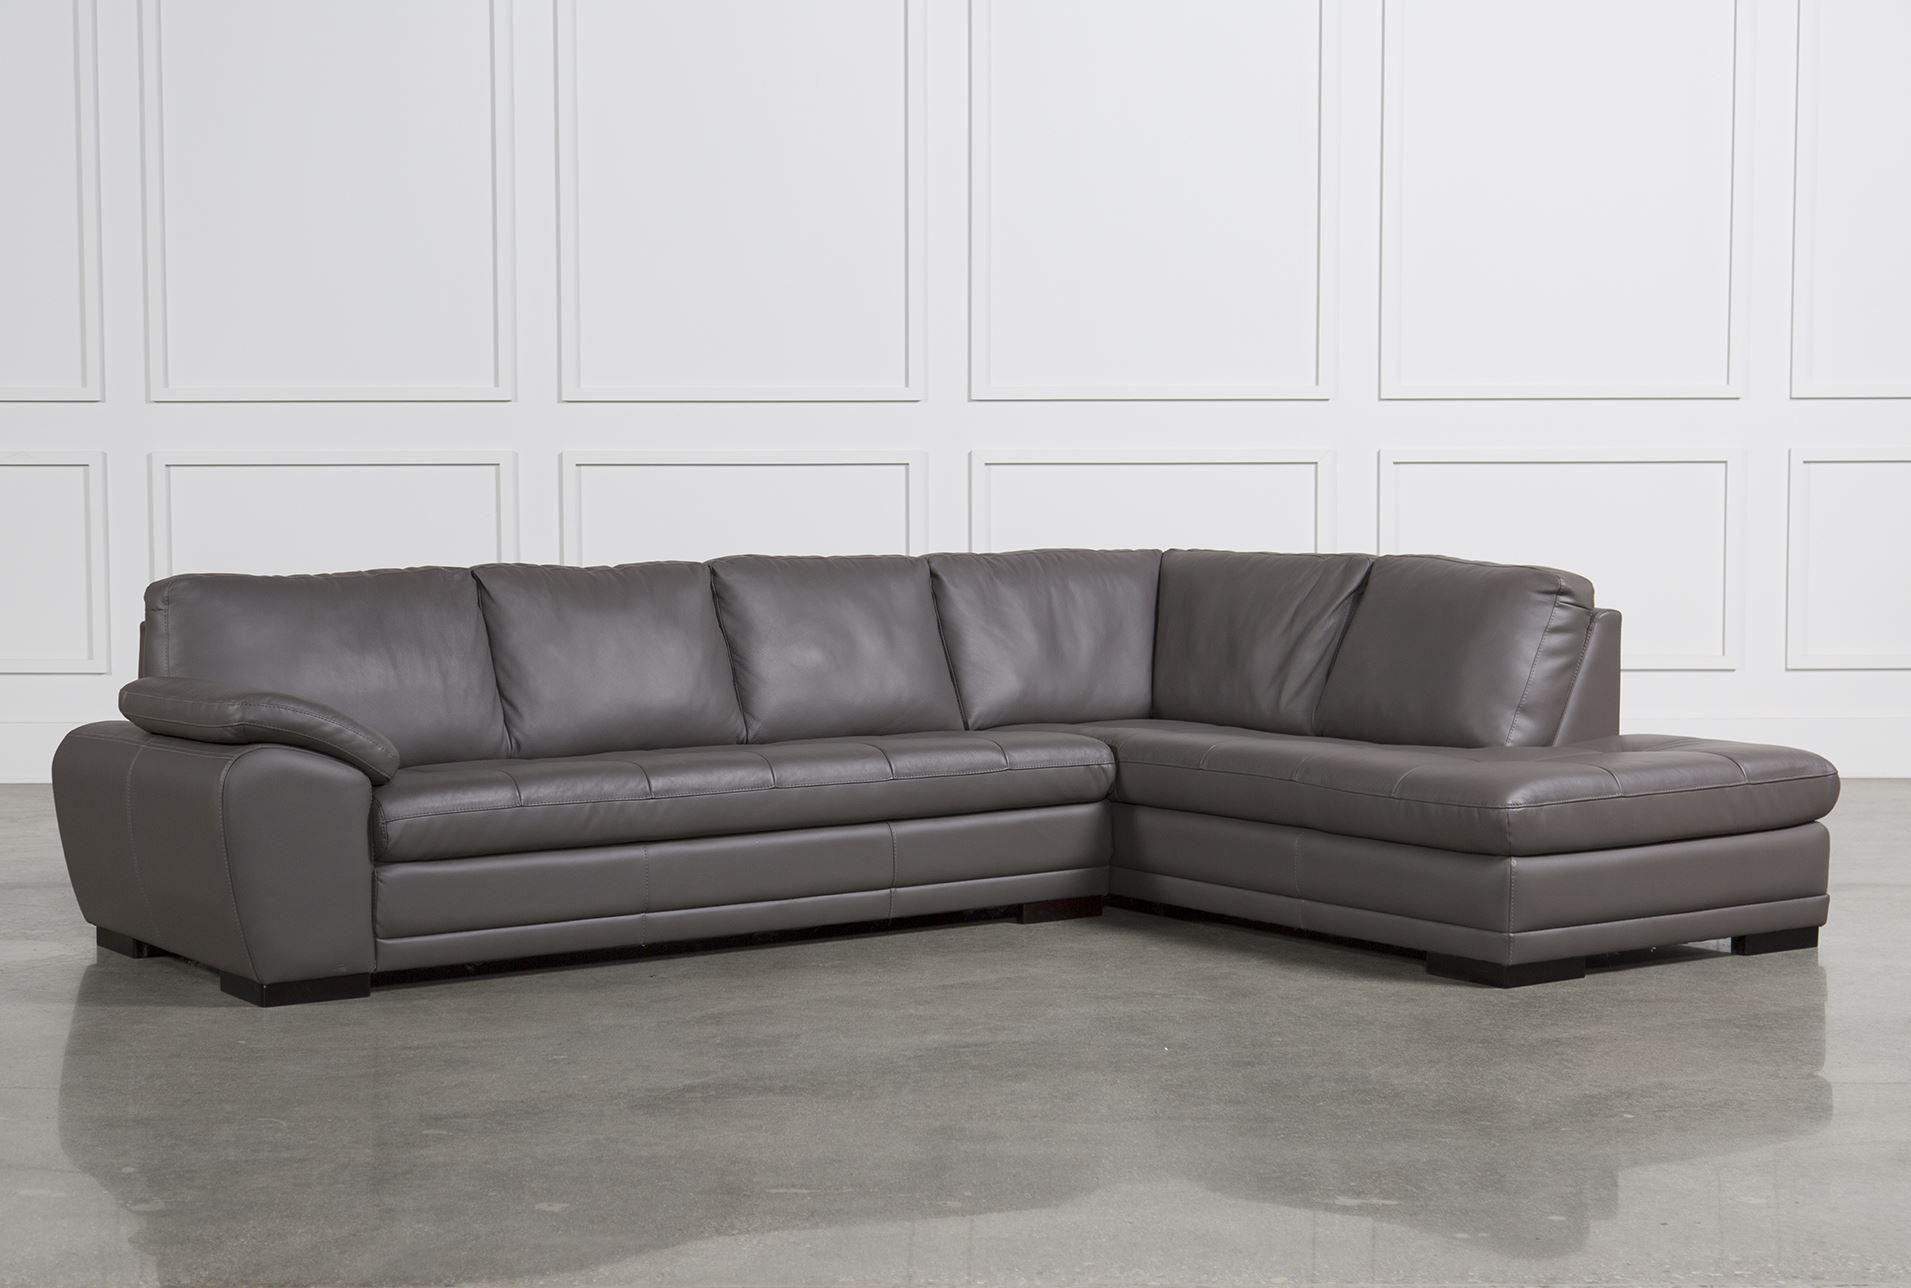 Corner Sofa Modular Contemporary Indoor Elliot Verzelloni - Furniture -